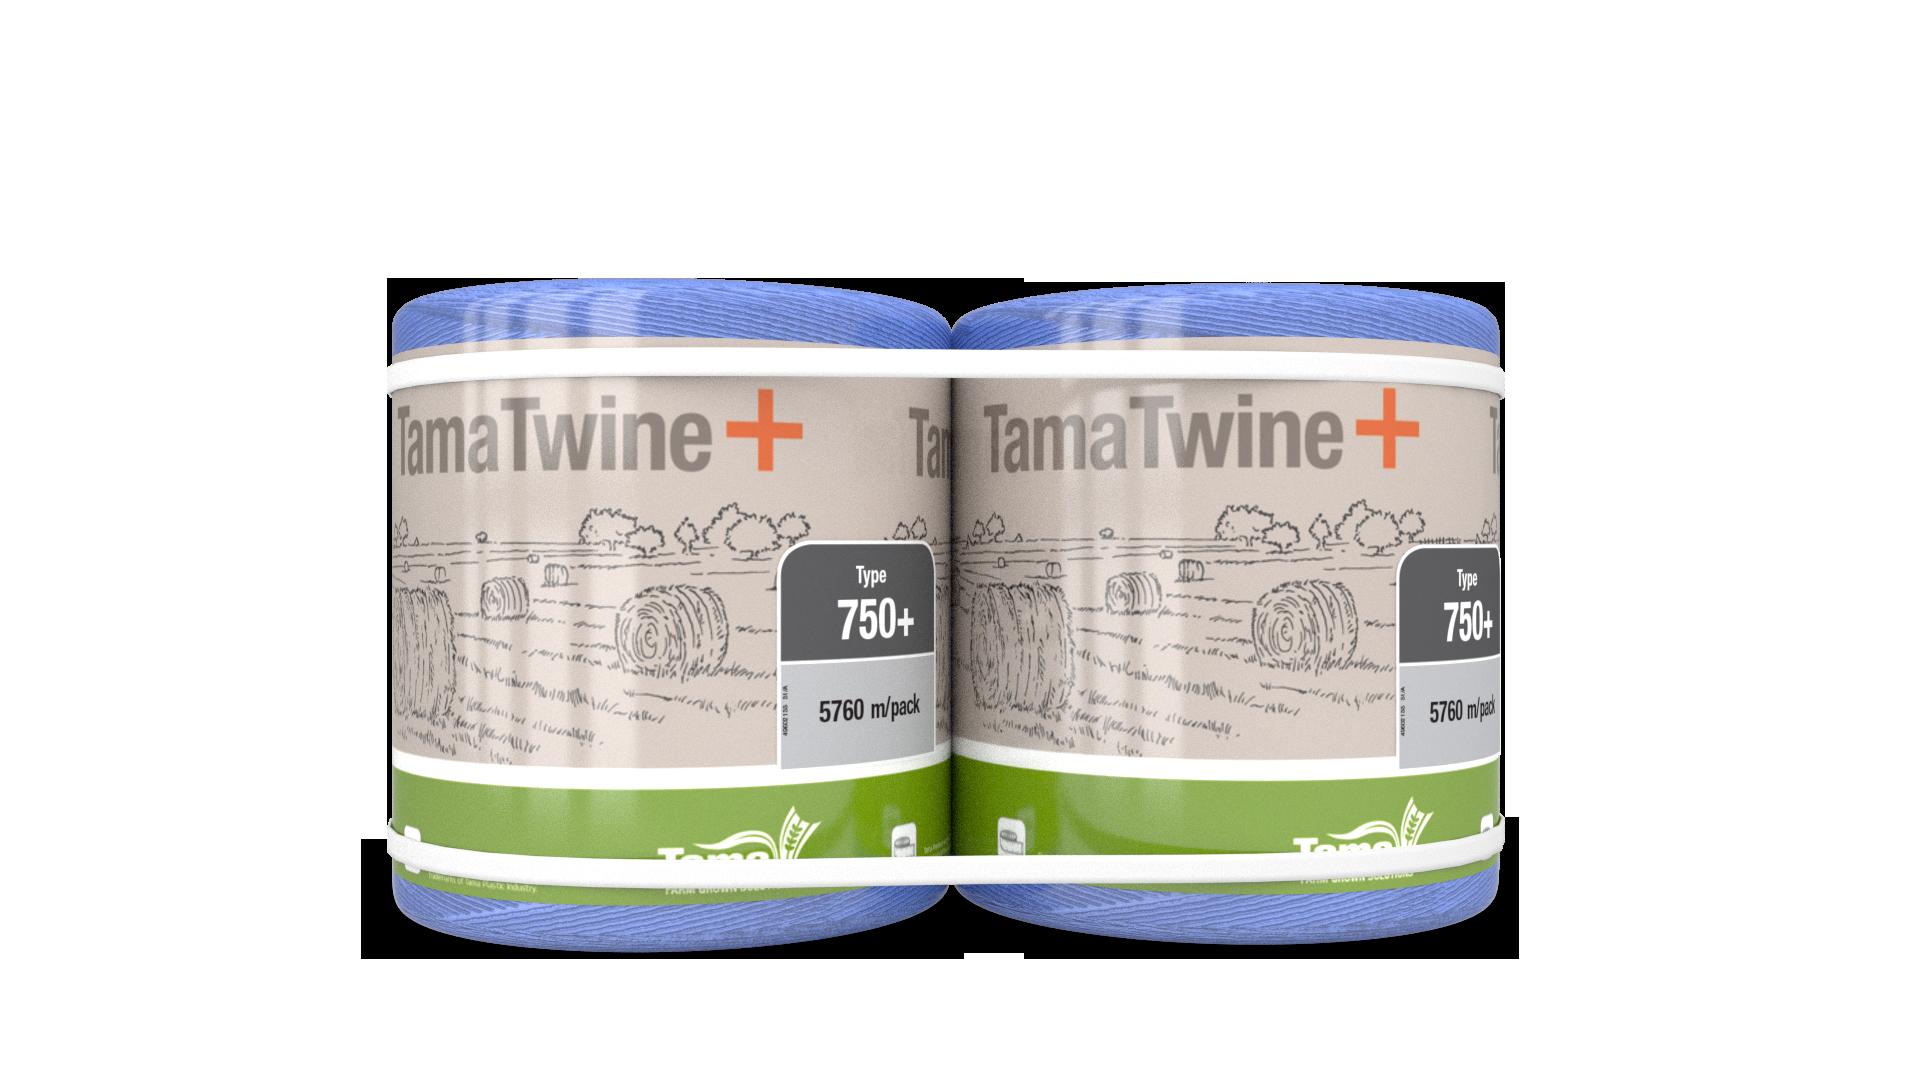 TamaTwinePlus Fine Pack